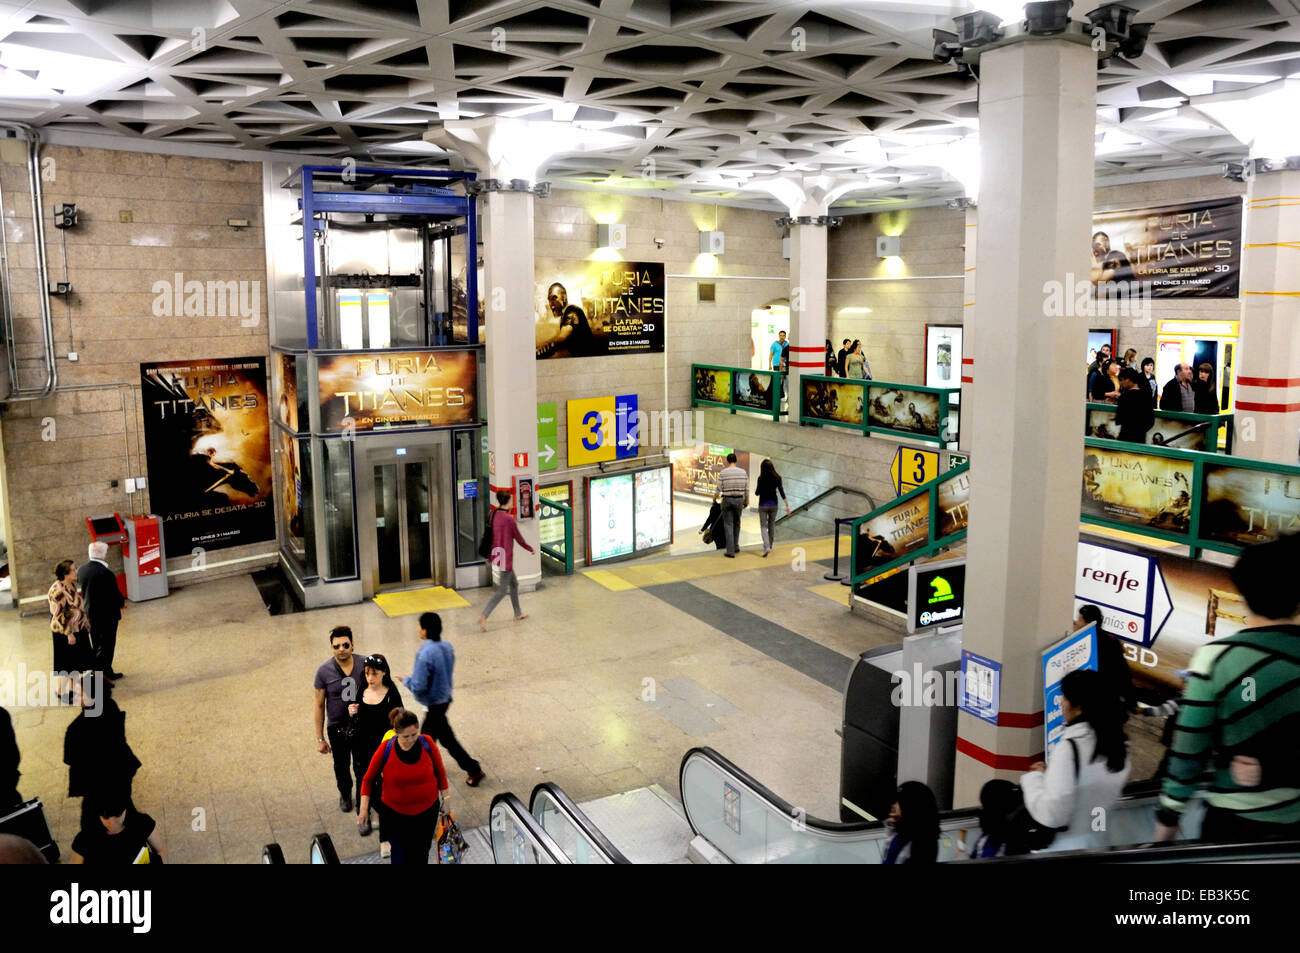 Madrid, Spain. Sol Metro station interior - Stock Image